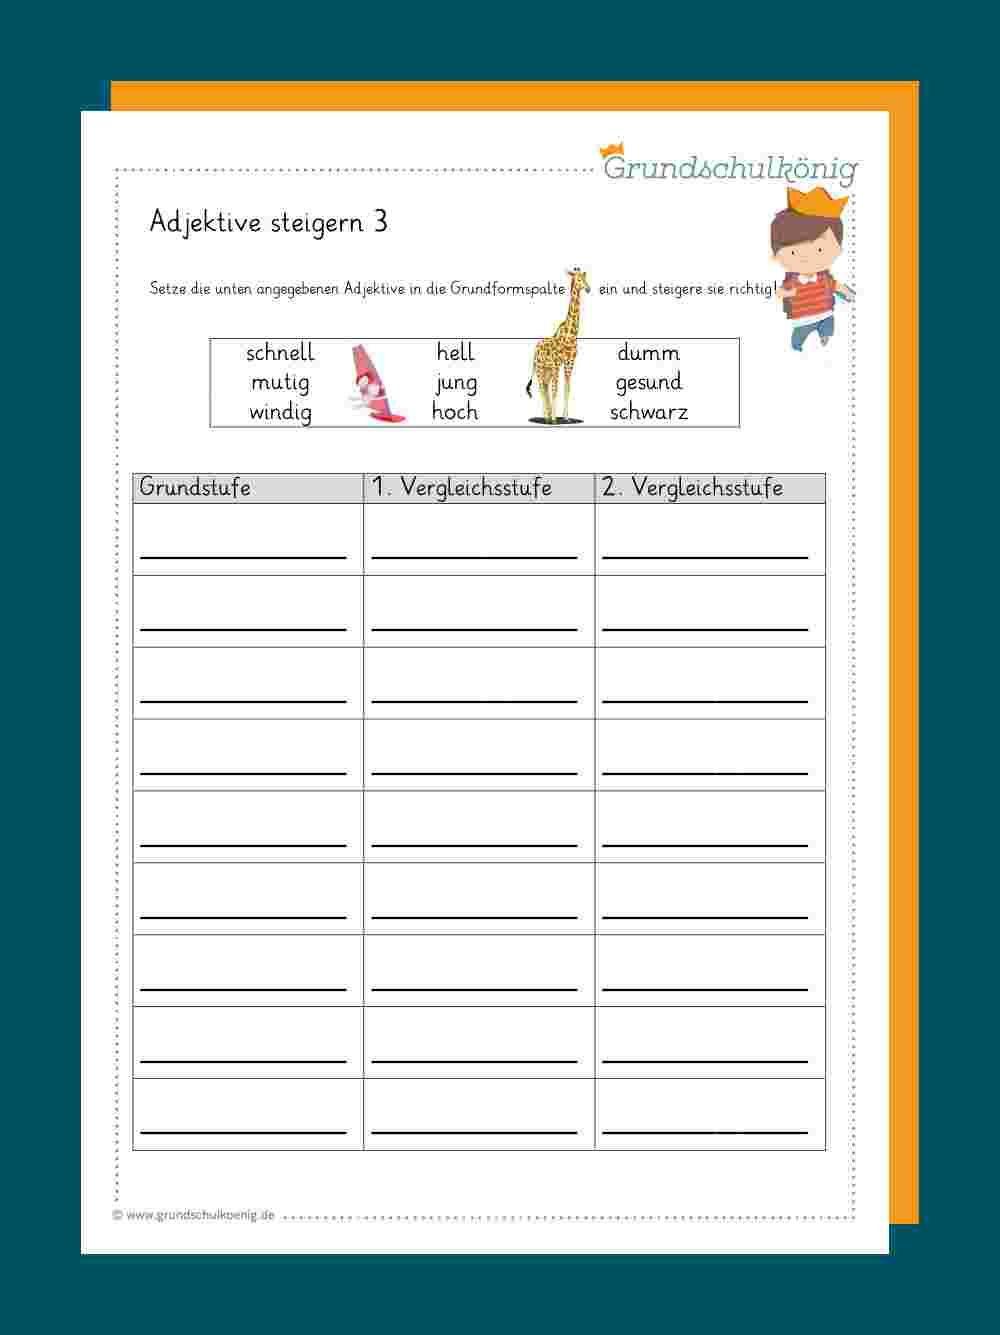 20 Adjektive Ideen   adjektive, adjektive grundschule, deutsch ...